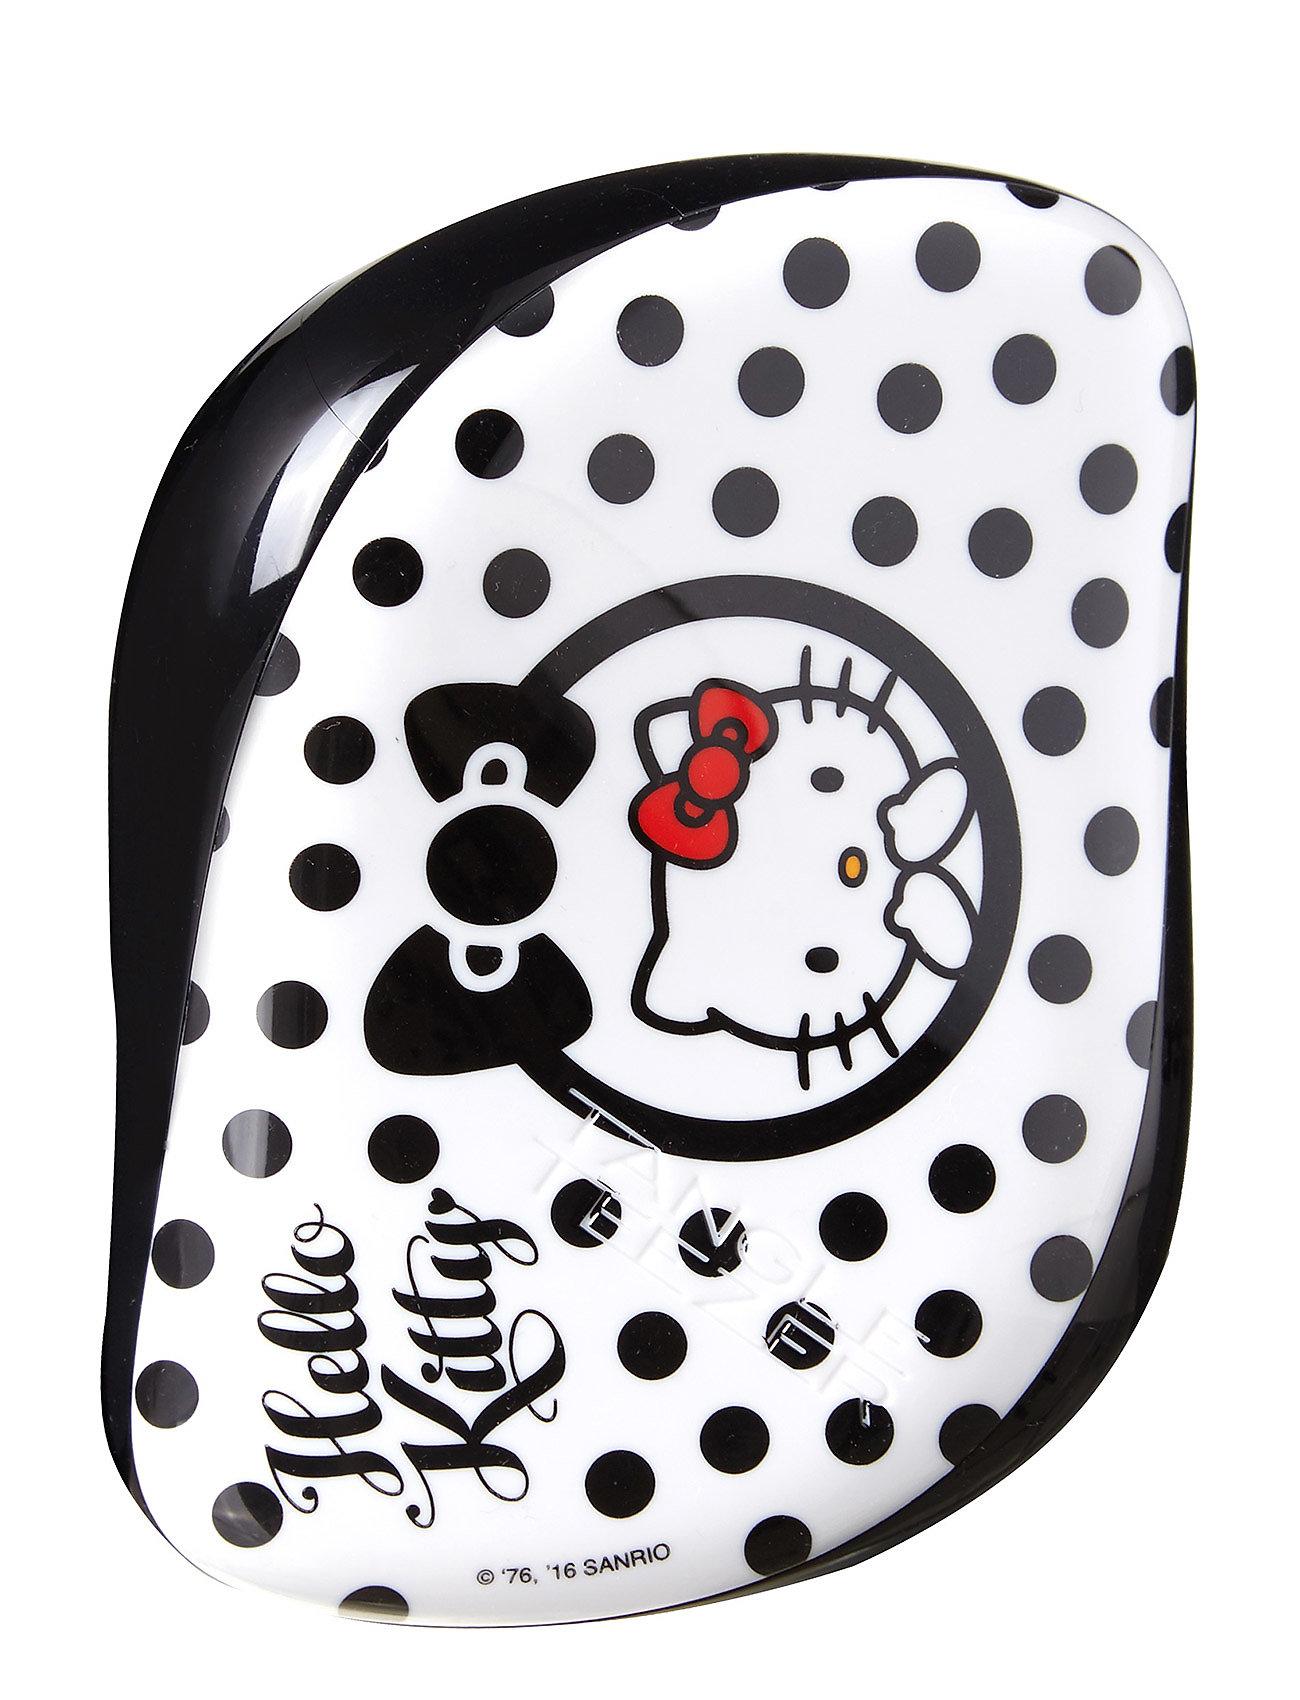 Tangle Teezer Tangle Teezer Compact Styler Hello Kitty Black - CLEAR